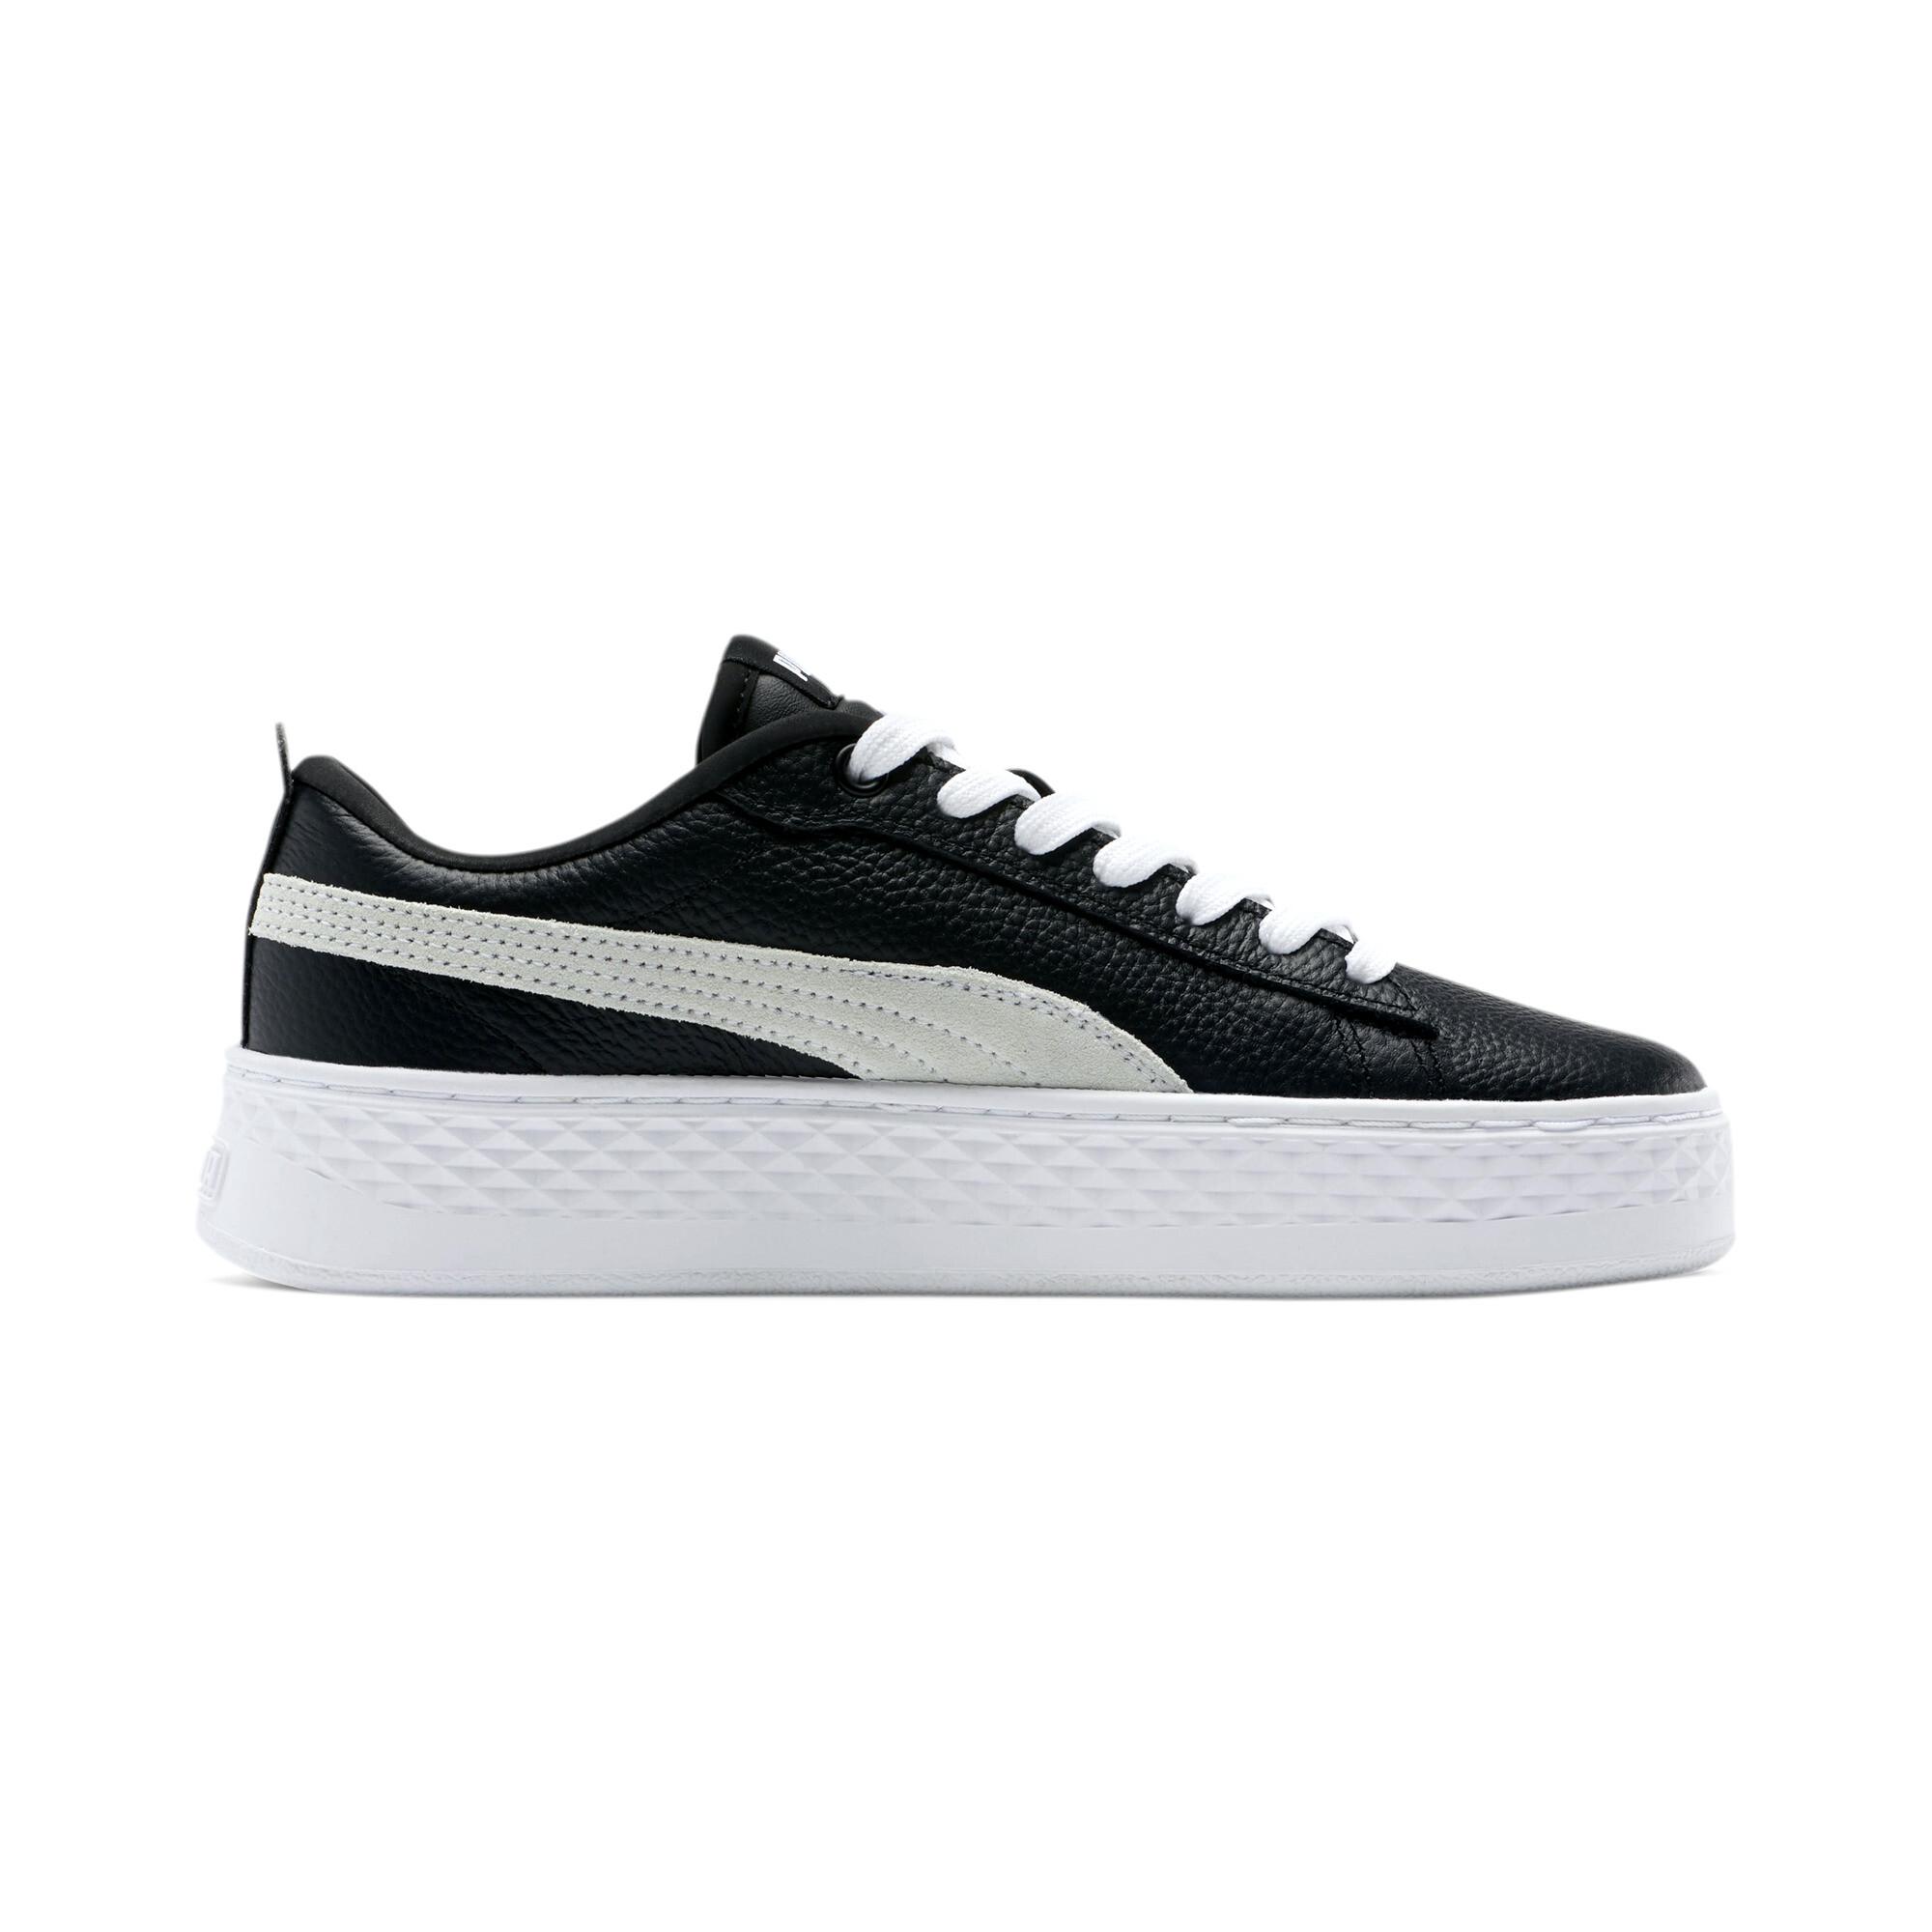 PUMA-Smash-Platform-Leather-Women-039-s-Sneakers-Women-Shoe-Basics thumbnail 21